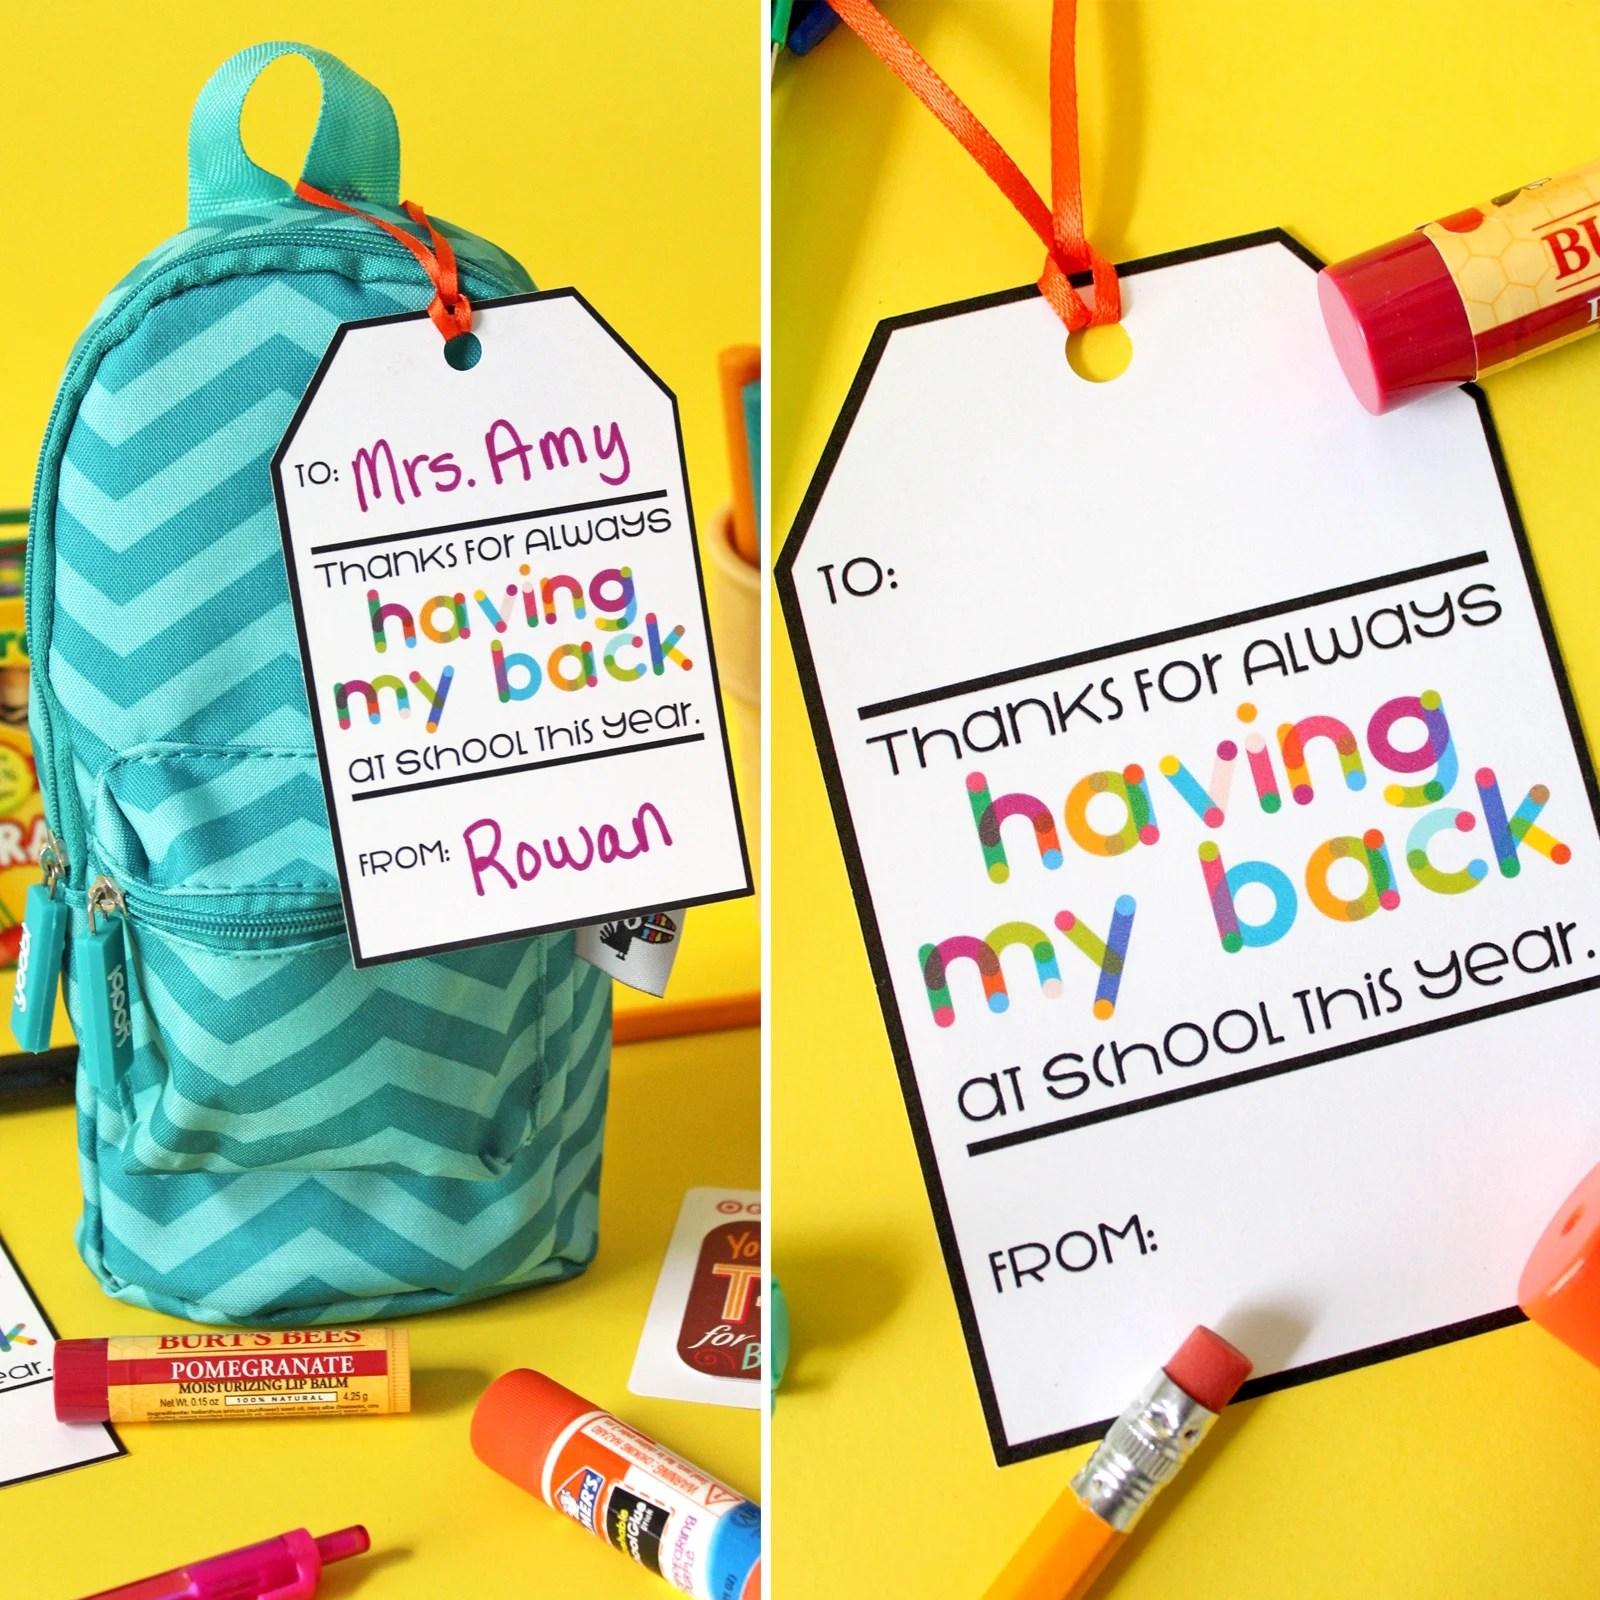 Free Printable Teacher Gift Tag: Thanks for Having My Back